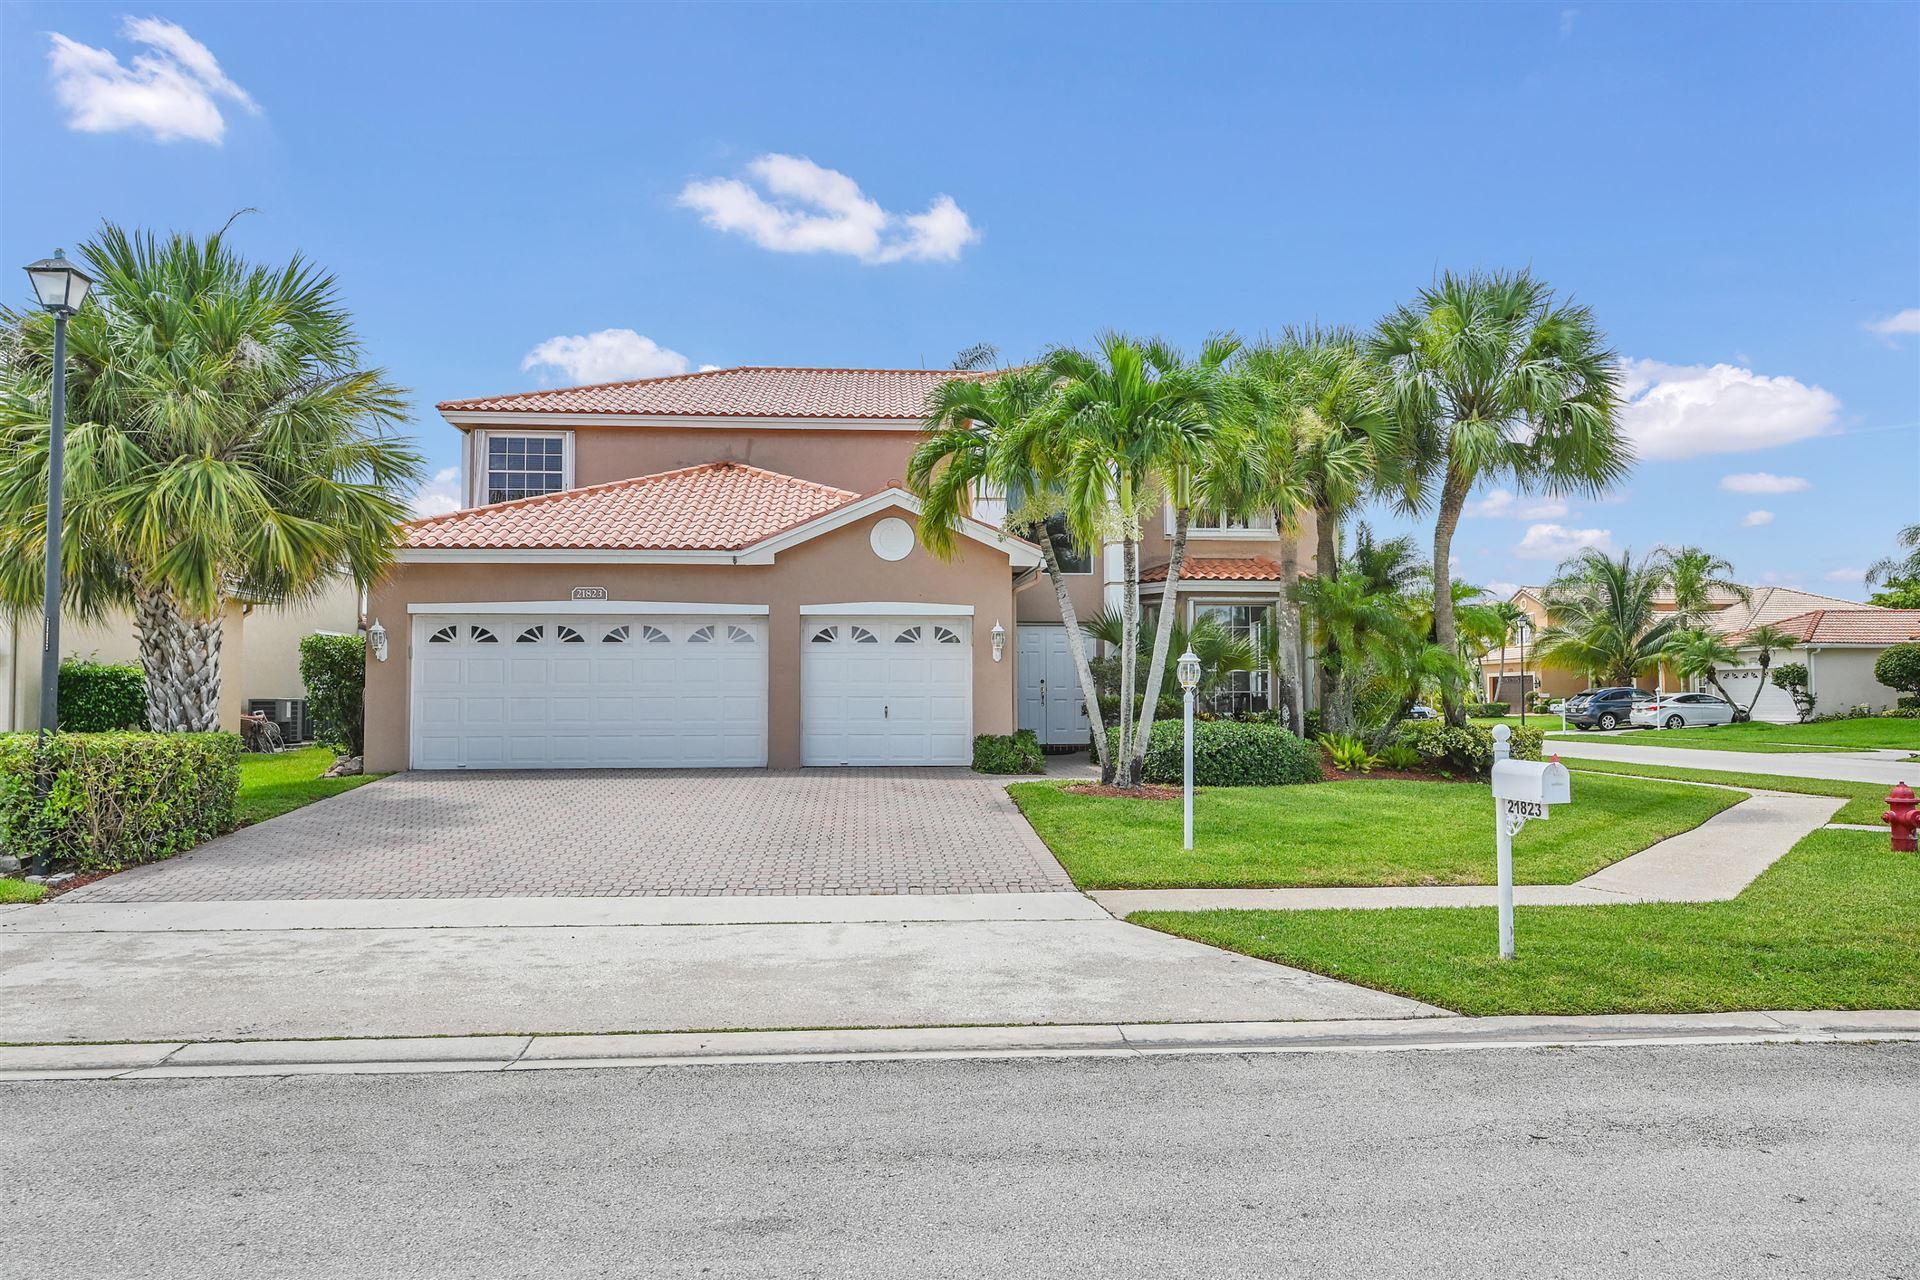 21823 Palm Grass Drive, Boca Raton, FL 33428 - MLS#: RX-10734640